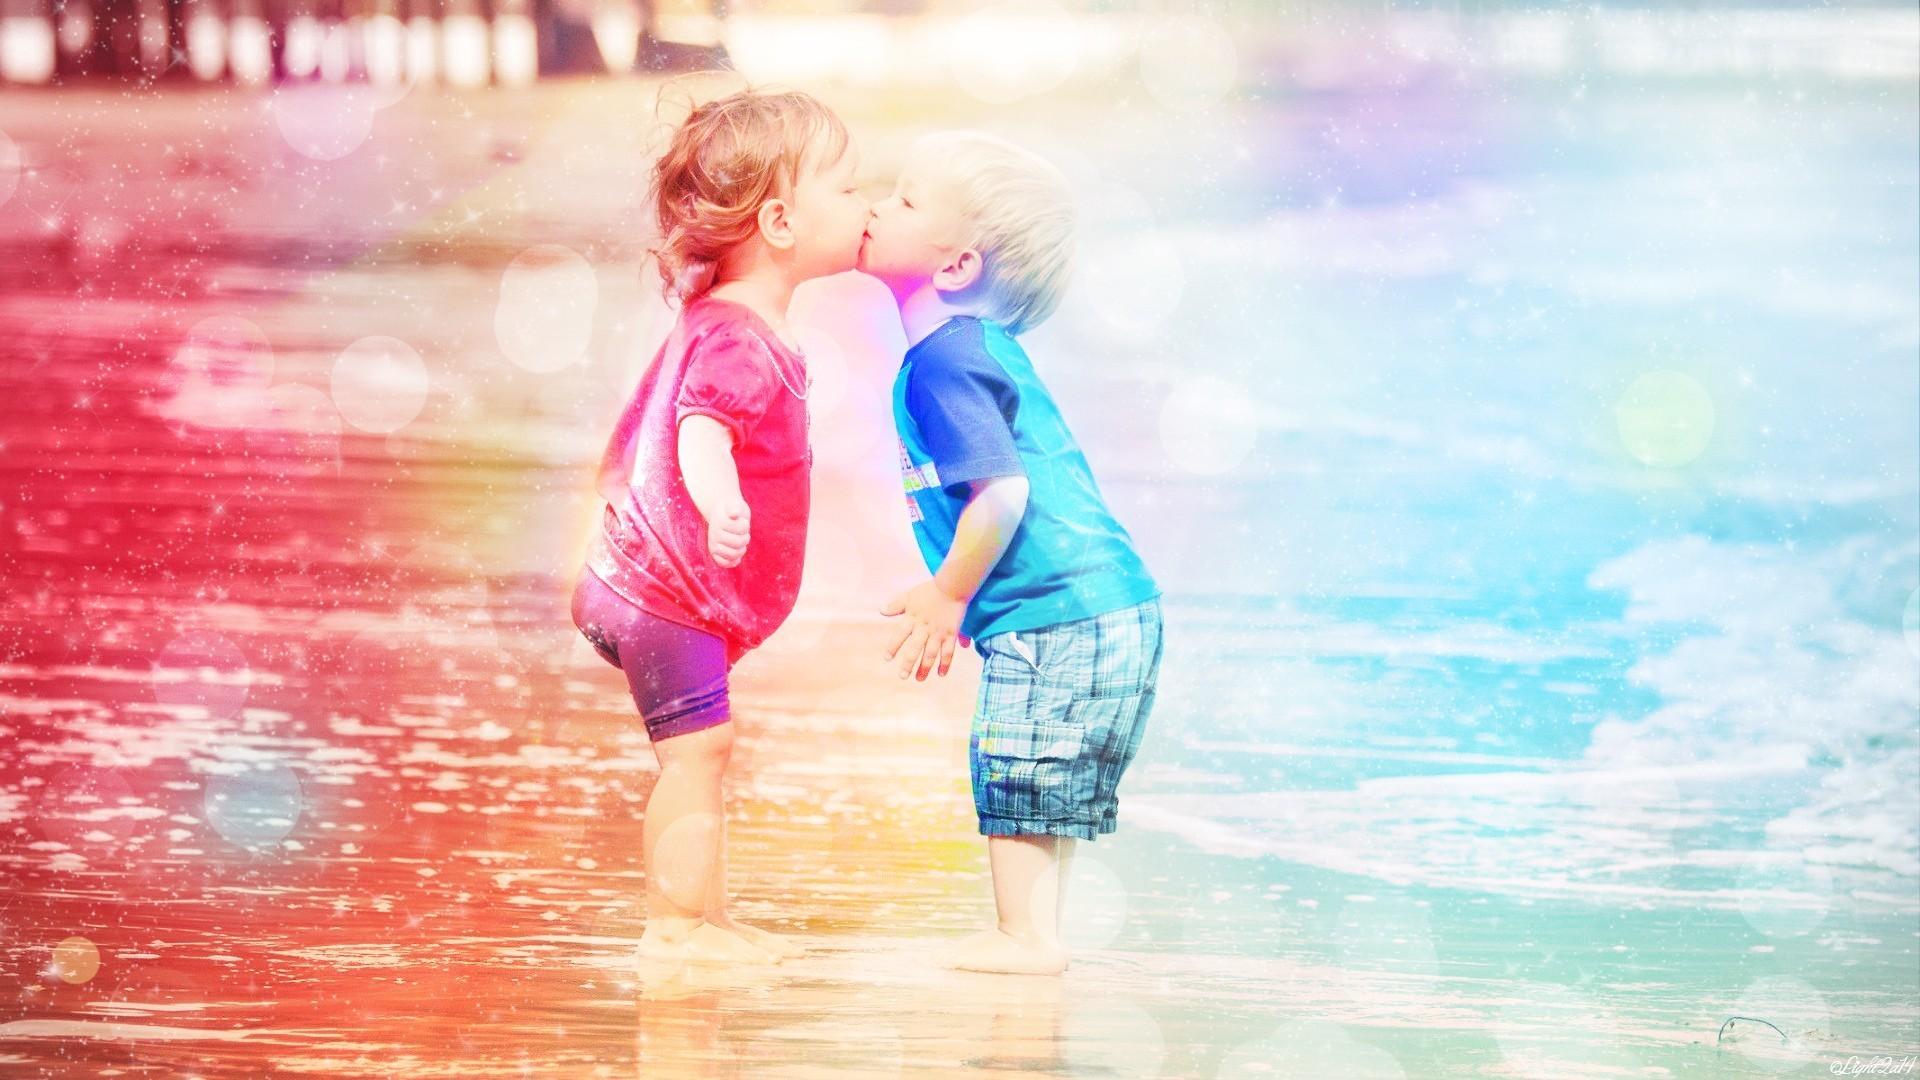 baby kiss wallpaper hd 1080p free download